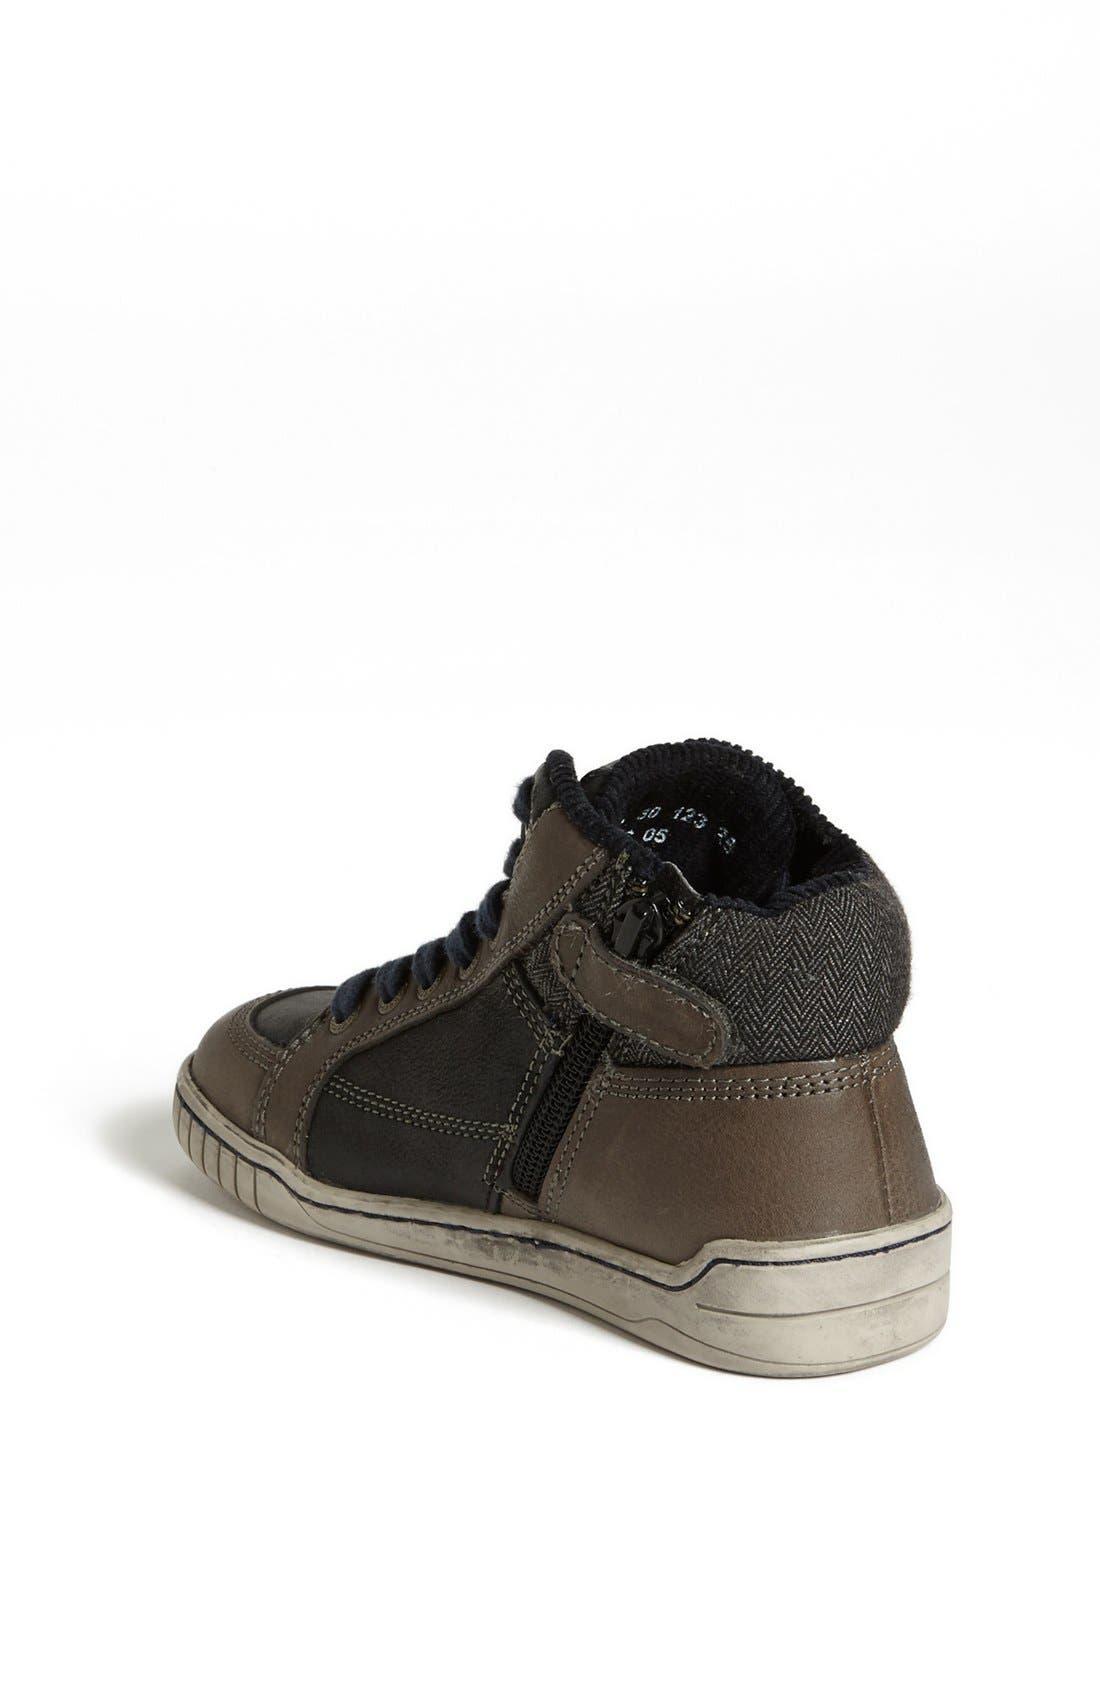 Alternate Image 2  - Kickers 'Wincut' Sneaker (Toddler, Little Kid & Big Kid)